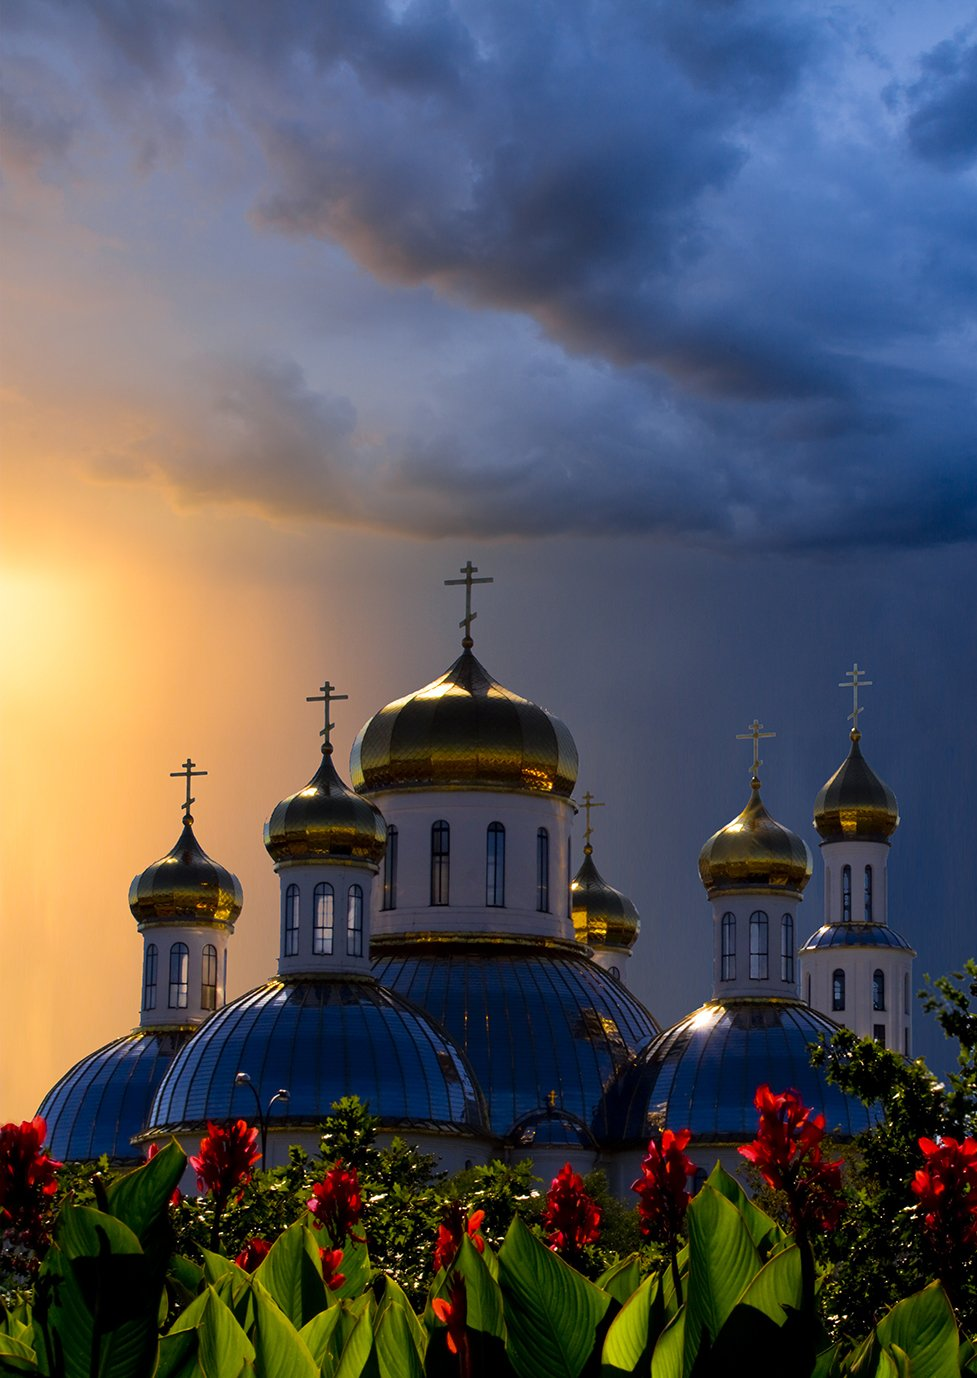 собор, церковь, цветы, закат, Фото Брест